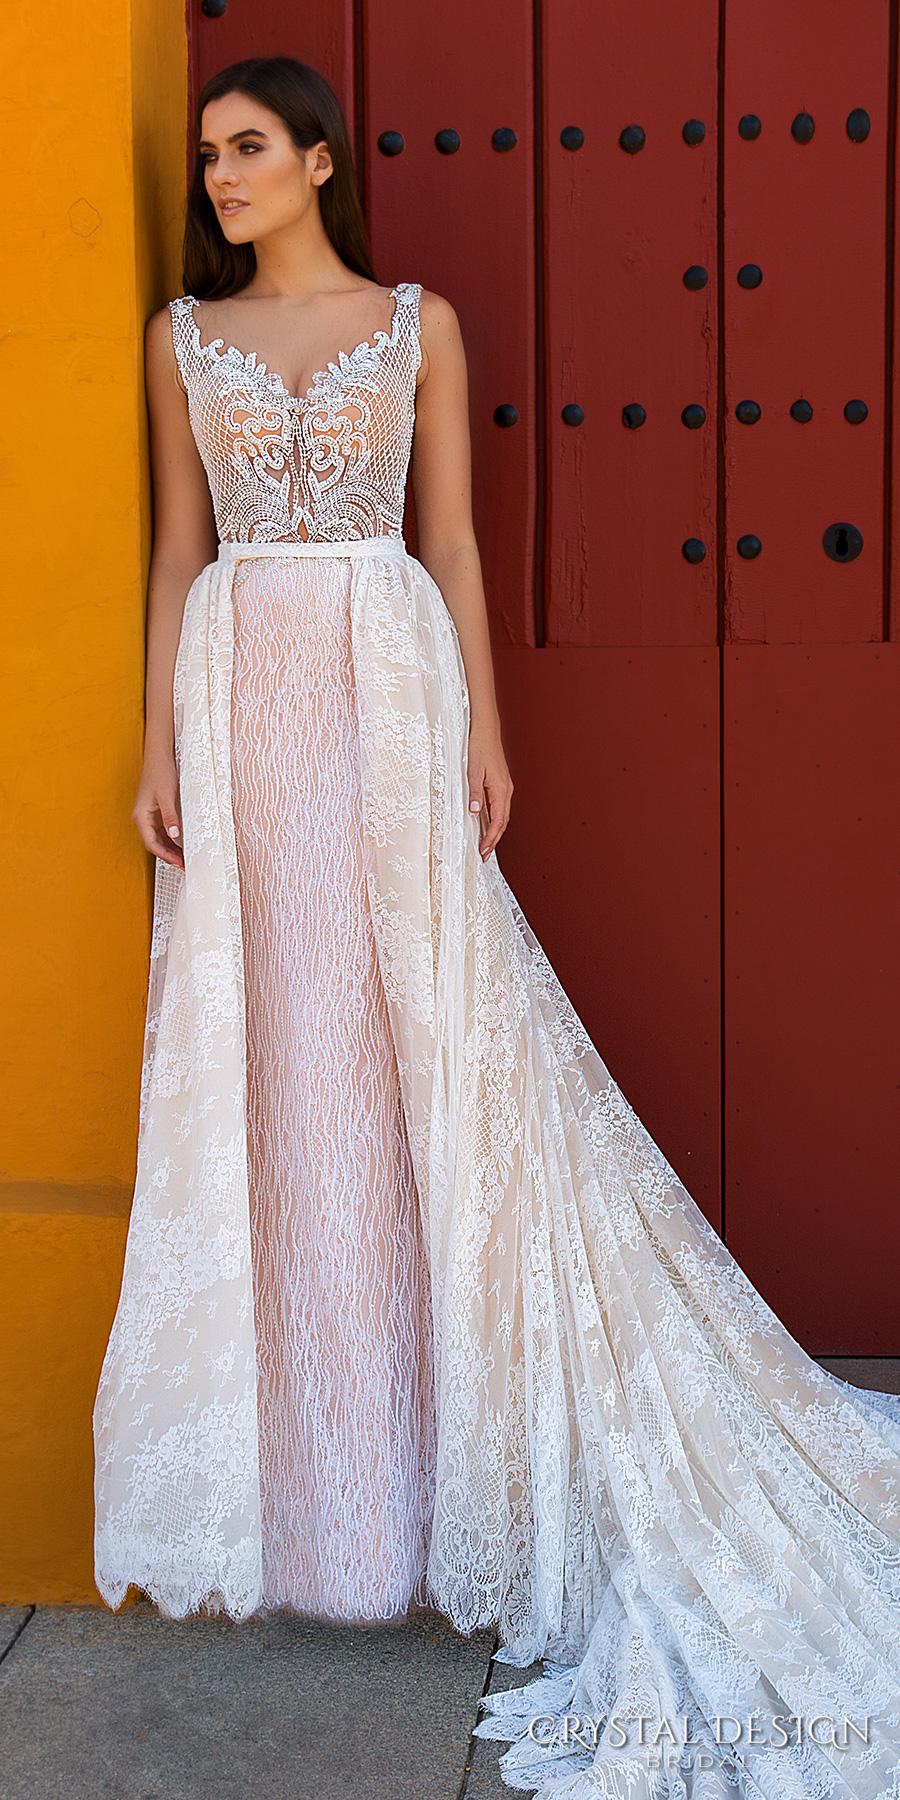 Crystal Design 2017 Bridal Sleeveless With Strap Full Embellishment Elegant Sheath Wedding Dress A Line Overskirt Lace Back Royal Train Eliza Mv